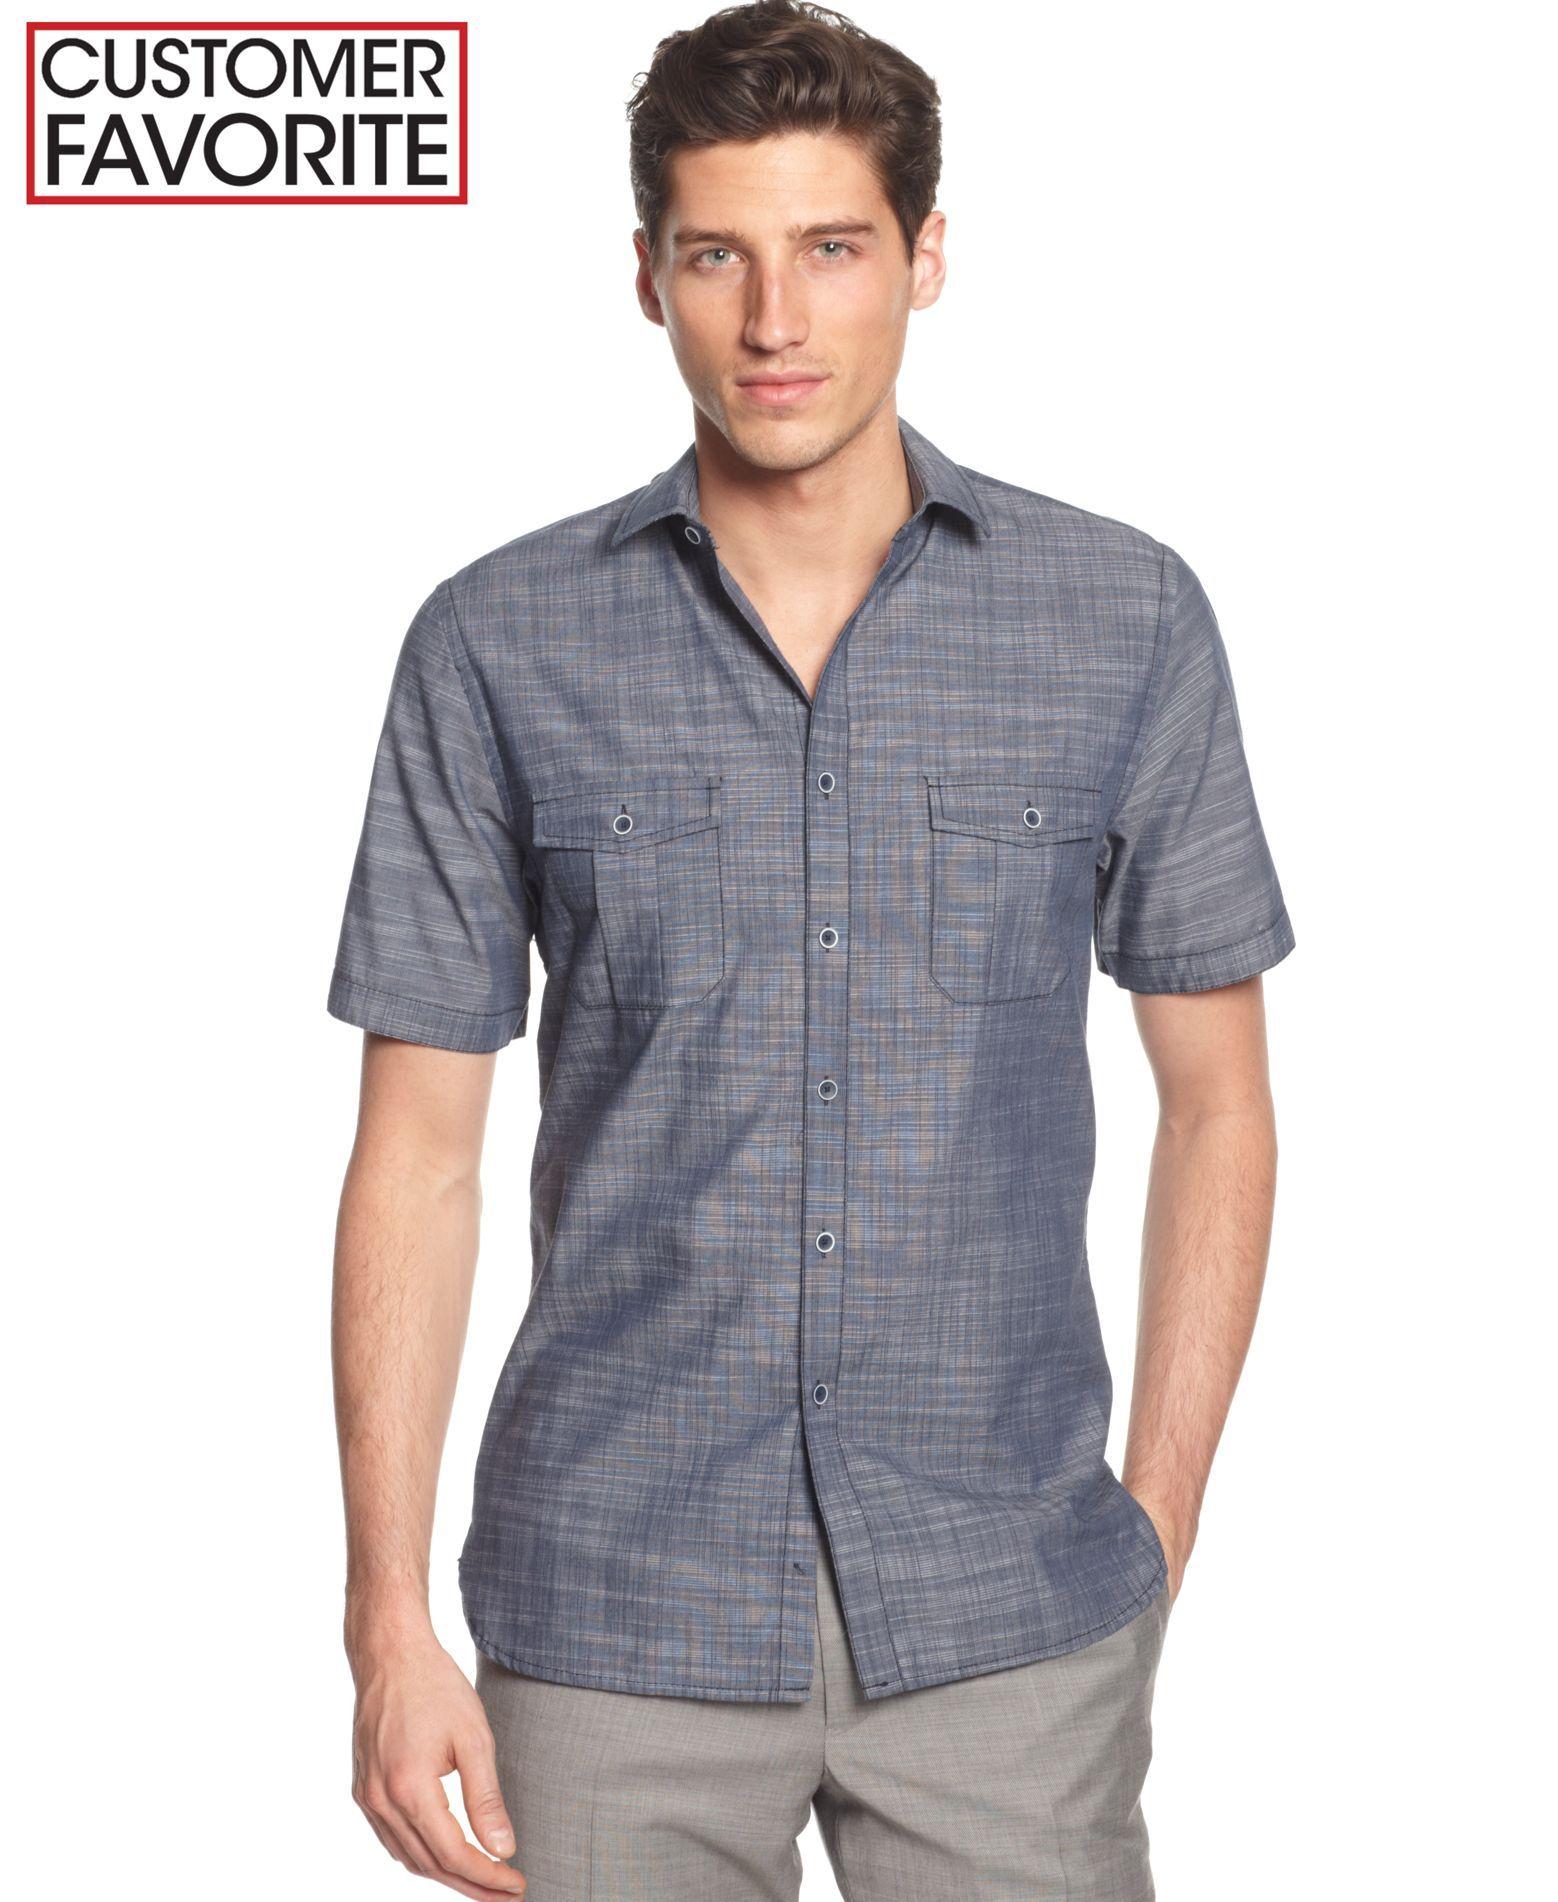 Alfani Black Warren Solid Short Sleeve Textured Shirt